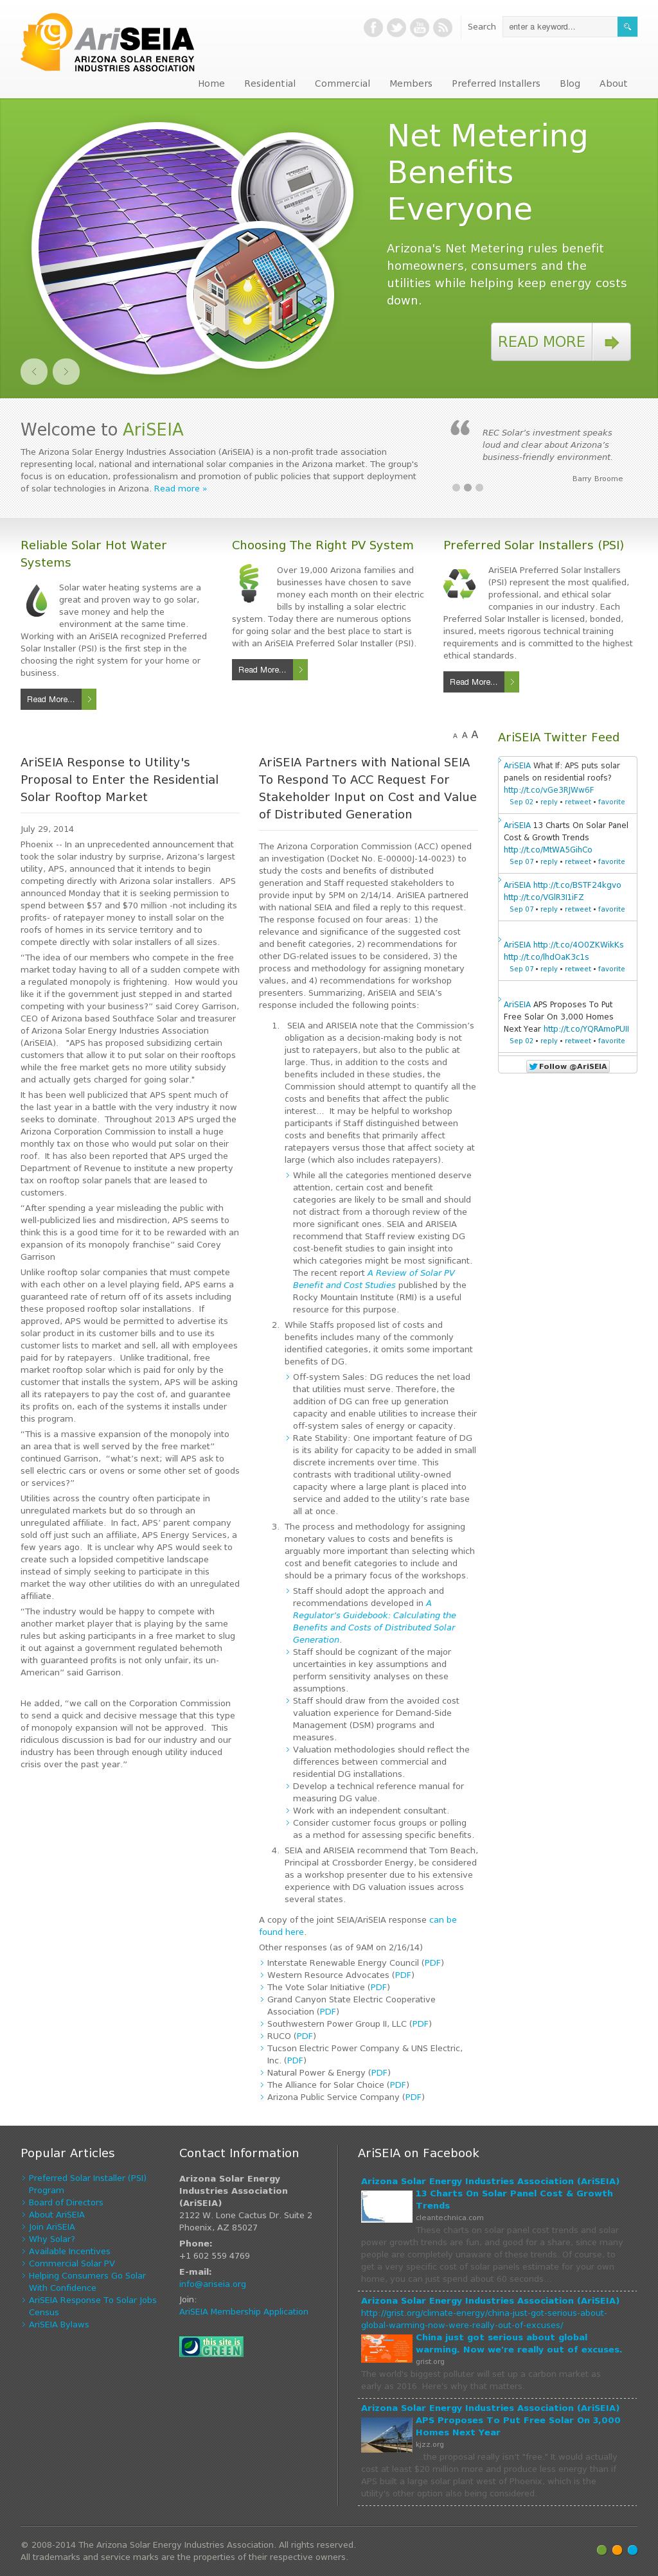 AriSEIA Competitors, Revenue and Employees - Owler Company Profile